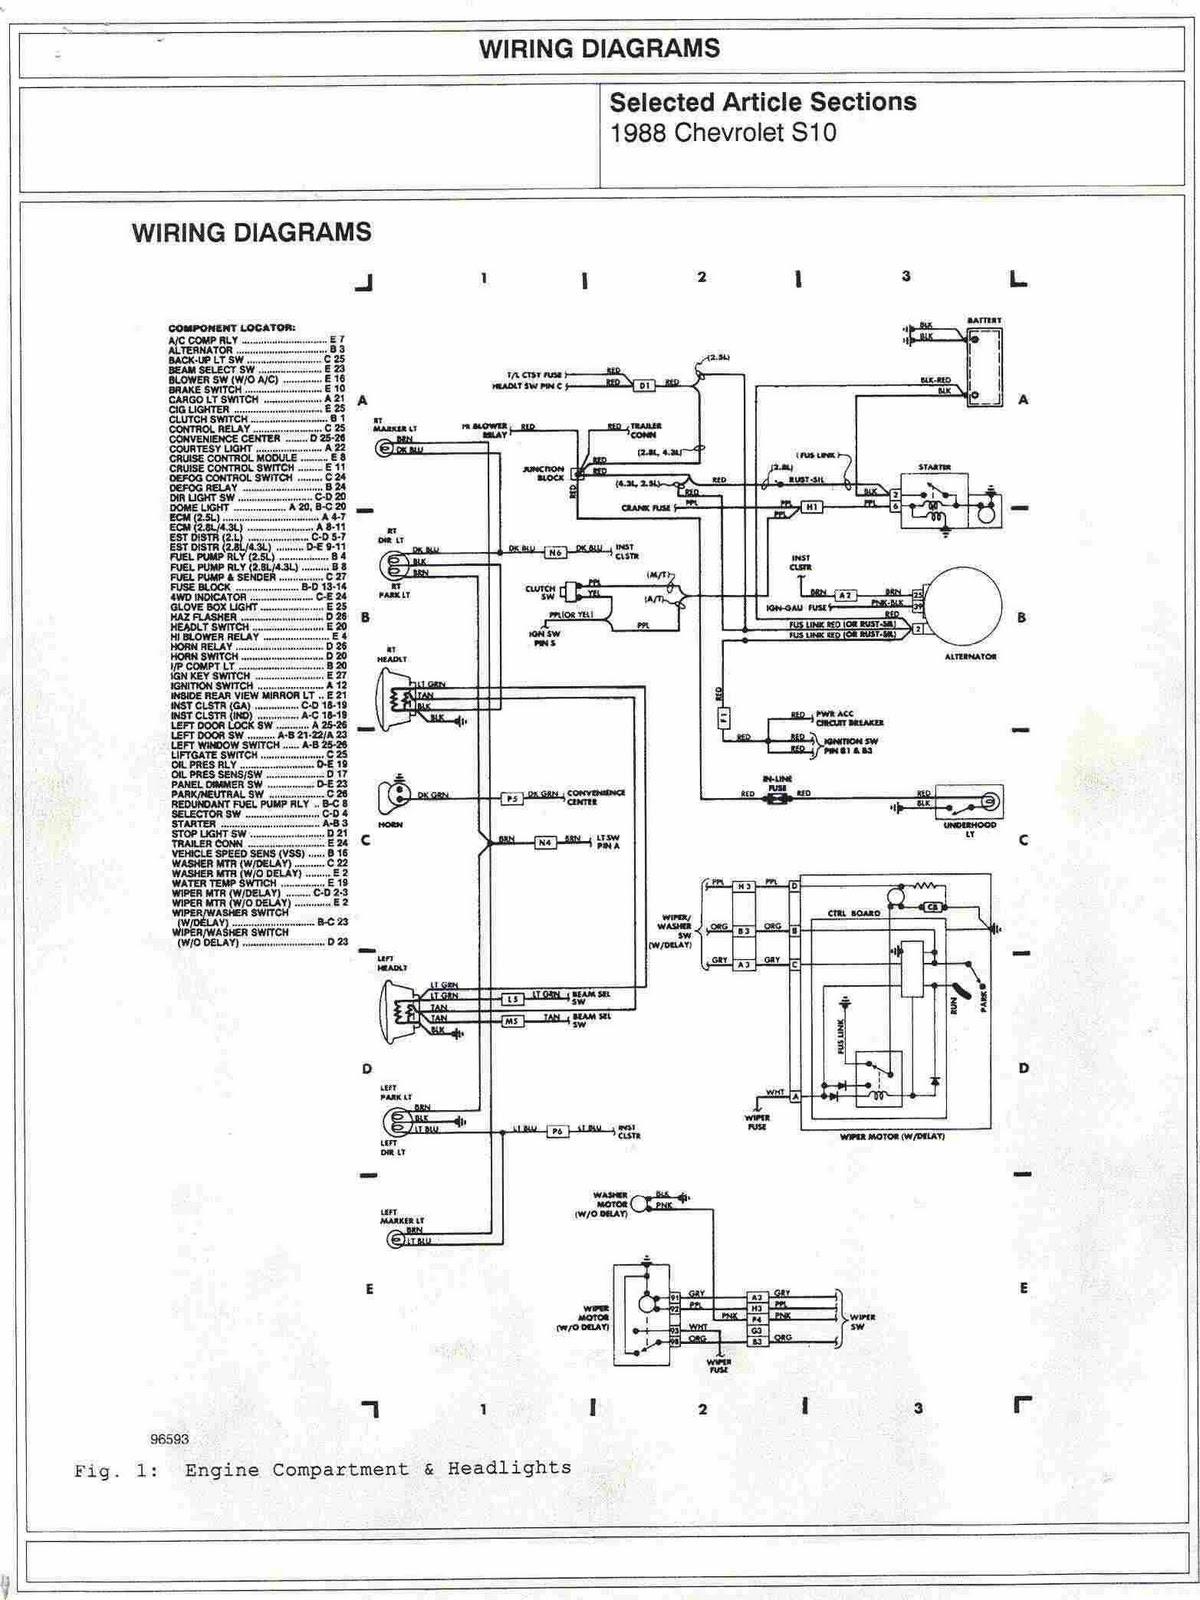 [DHAV_9290]  EB_2109] 94 Eldorado Turn Signal Wiring Diagram Wiring Diagram Photos For  Wiring Diagram | 2001 Cadillac Eldorado Wiring Harness |  | Epete Elae Icaen Onom Embo Adit Ologi Lave Synk Cette Mohammedshrine Librar  Wiring 101